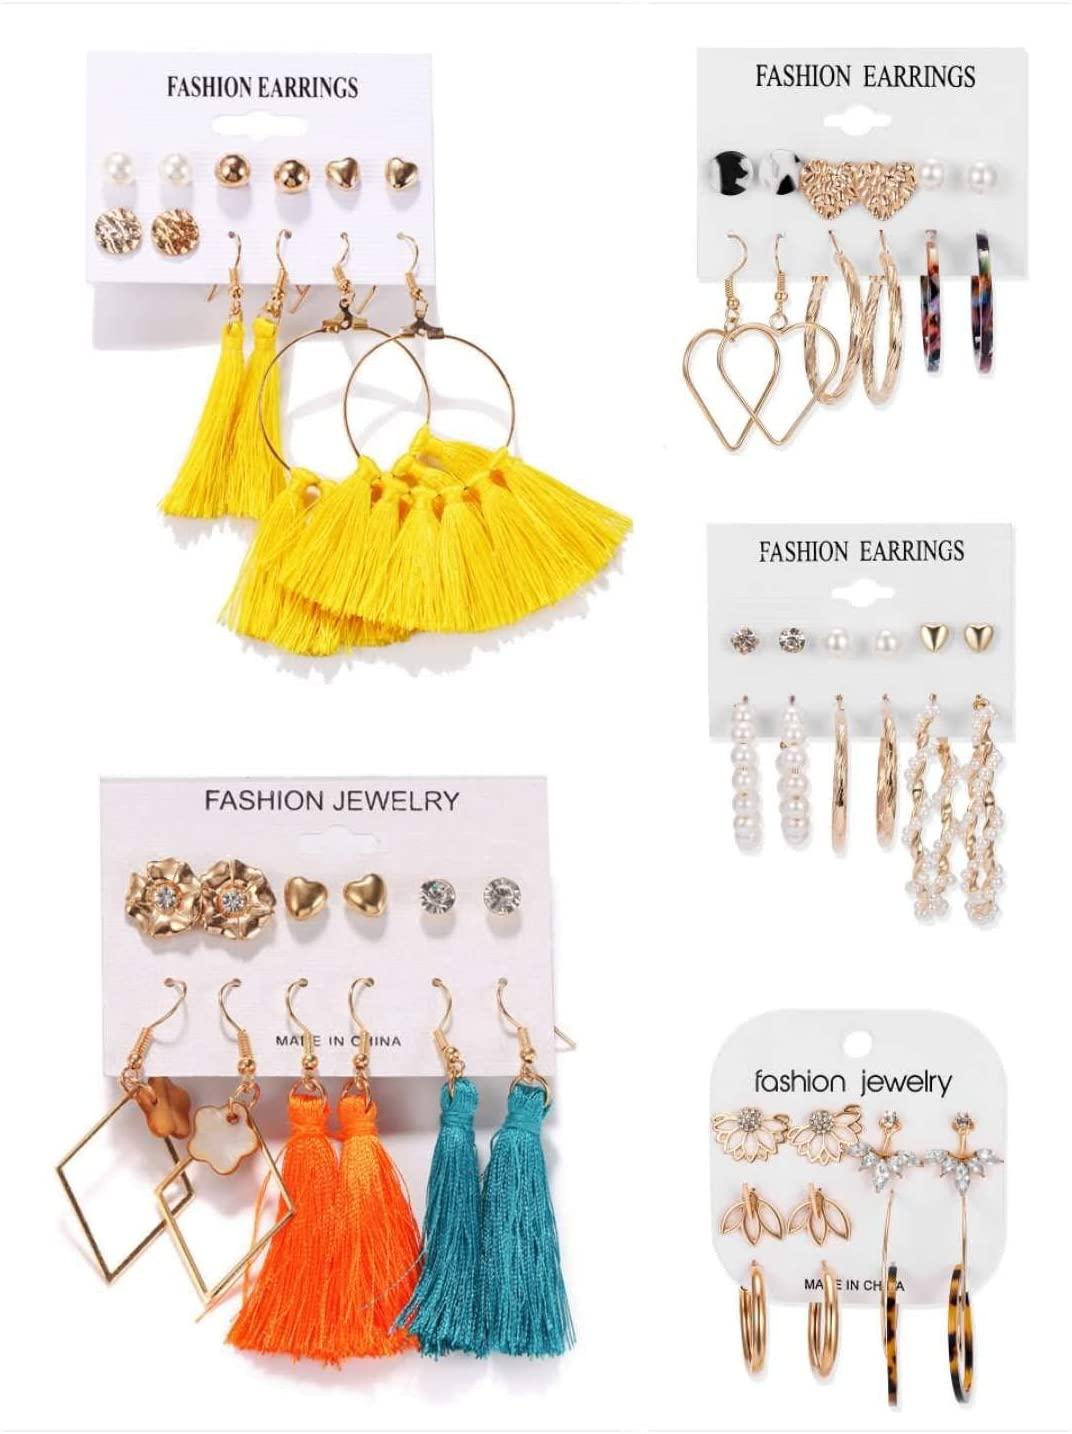 30 Pairs of Fashionable Geometric Acetate Plate Earrings, Pearl Stud Earrings, Creative Alloy Retro Ethnic Tassel Earrings, Fashion Earrings for Men and Women